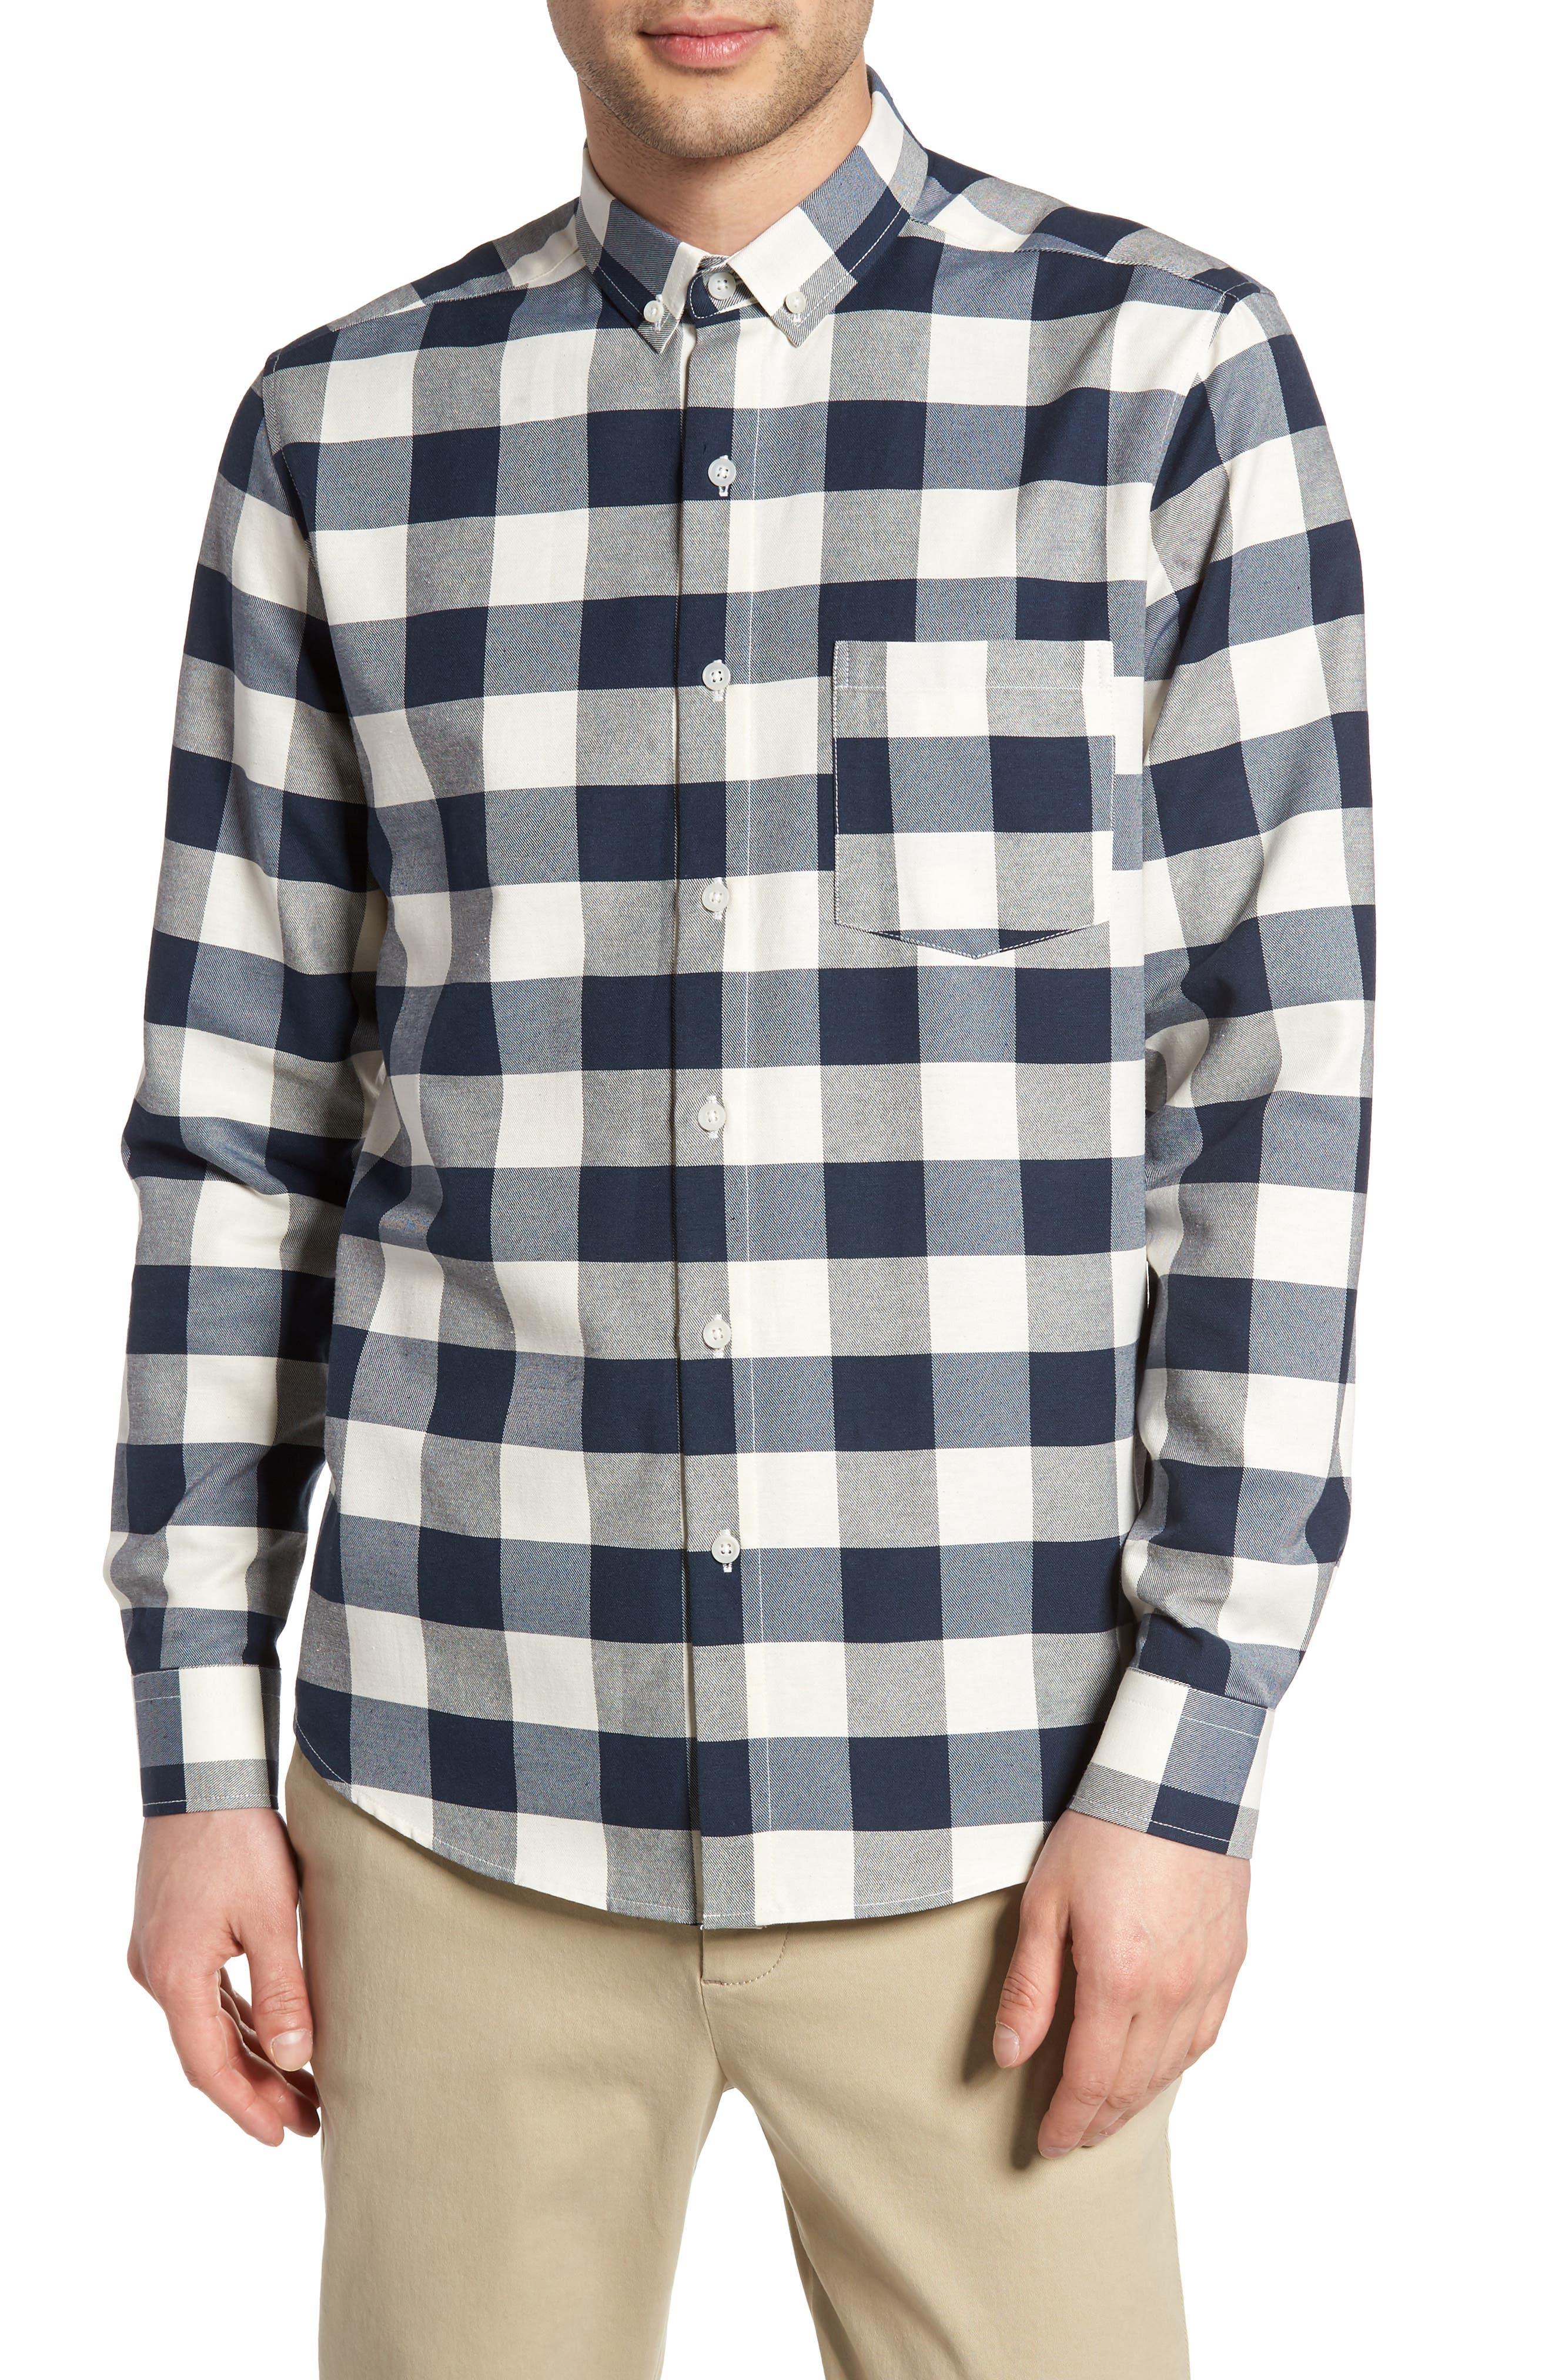 Main Image - Topman Check Twill Shirt